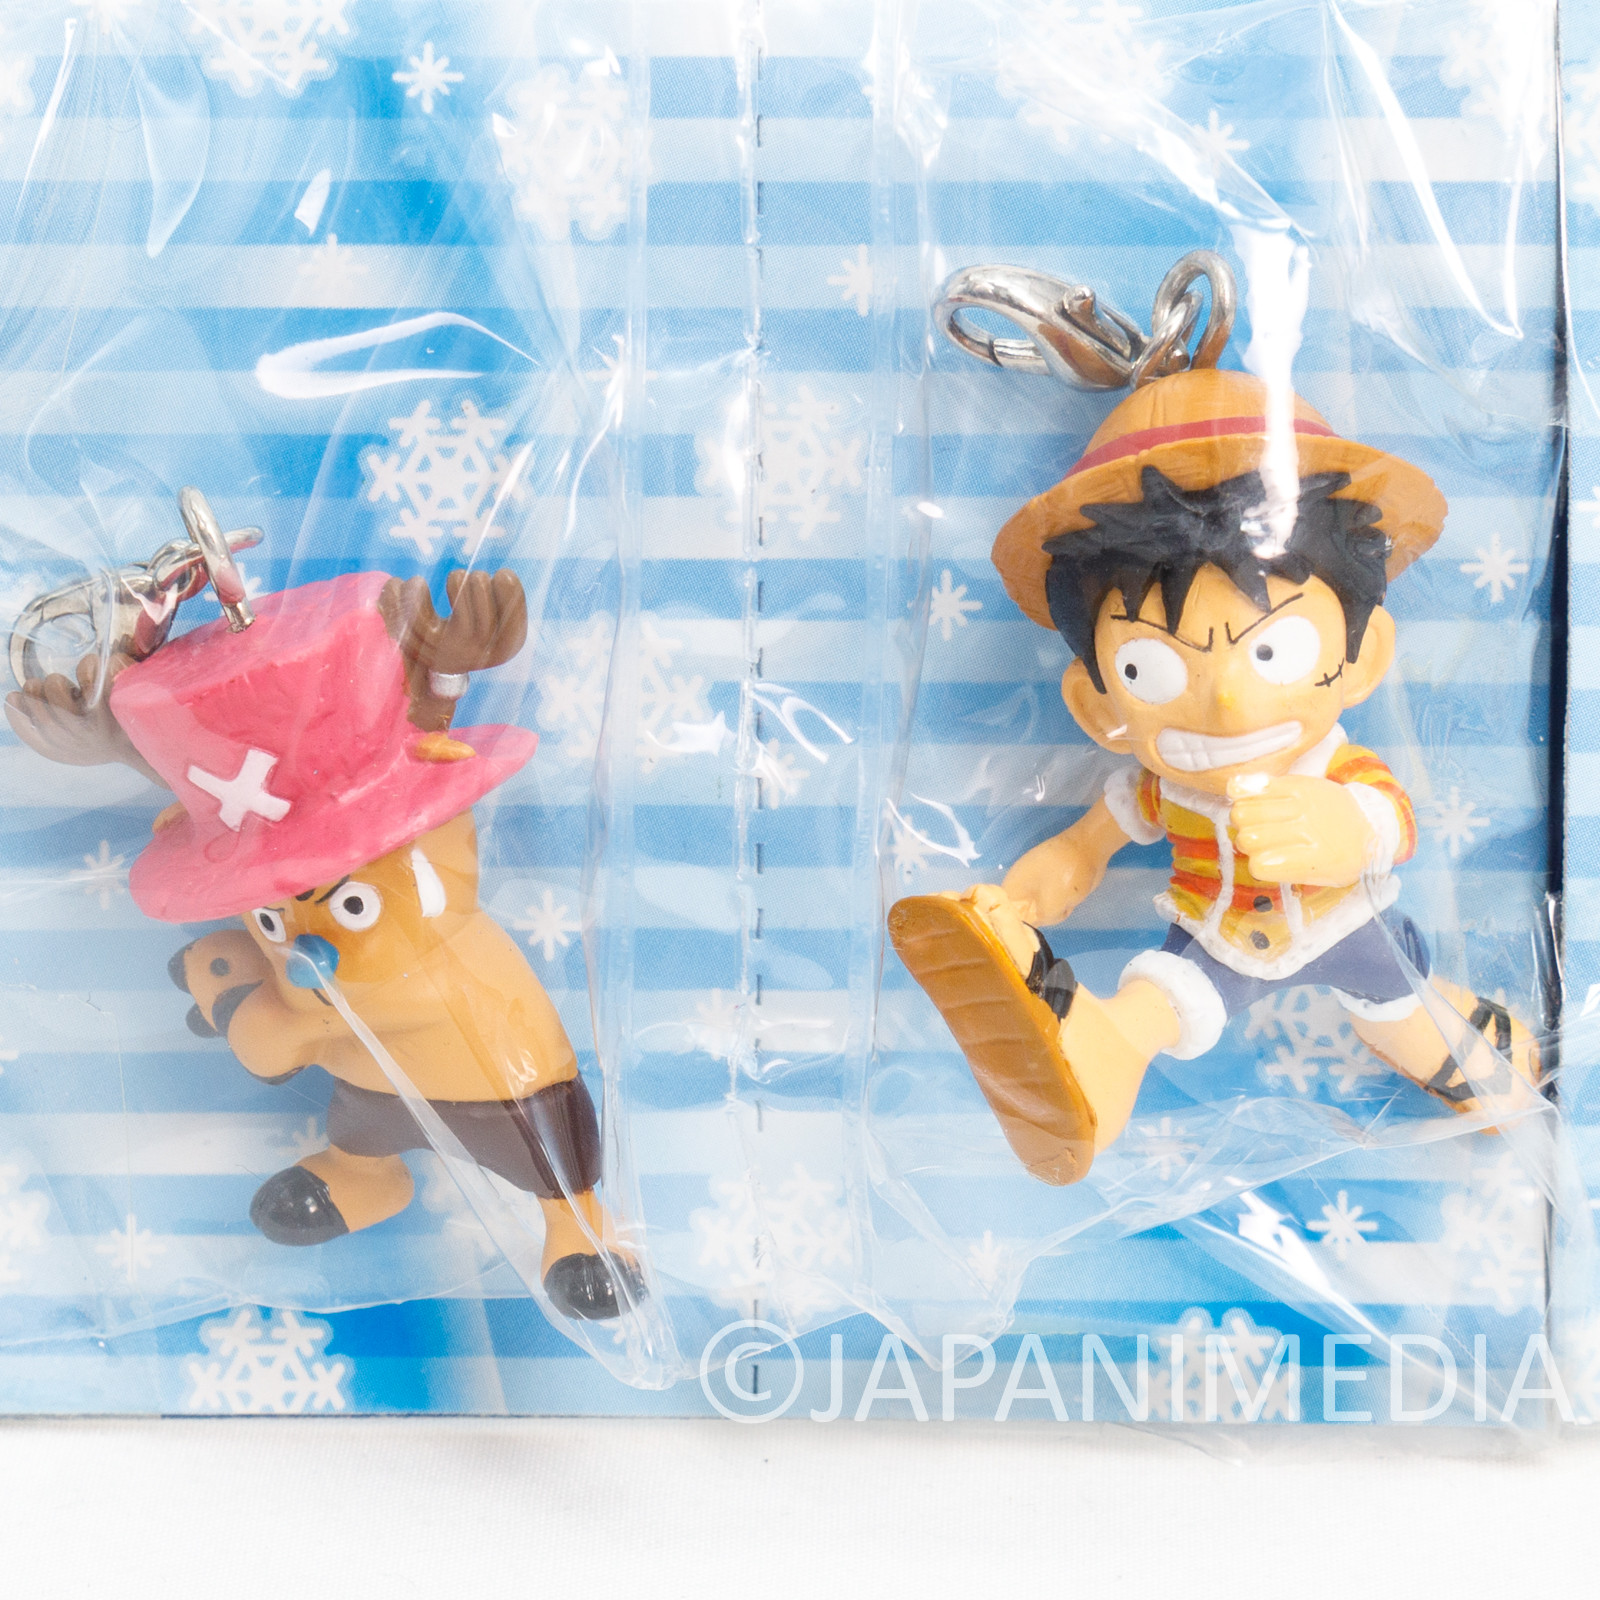 One Piece Luffy & Chopper Figure Mascot Charm Banpresto JAPAN